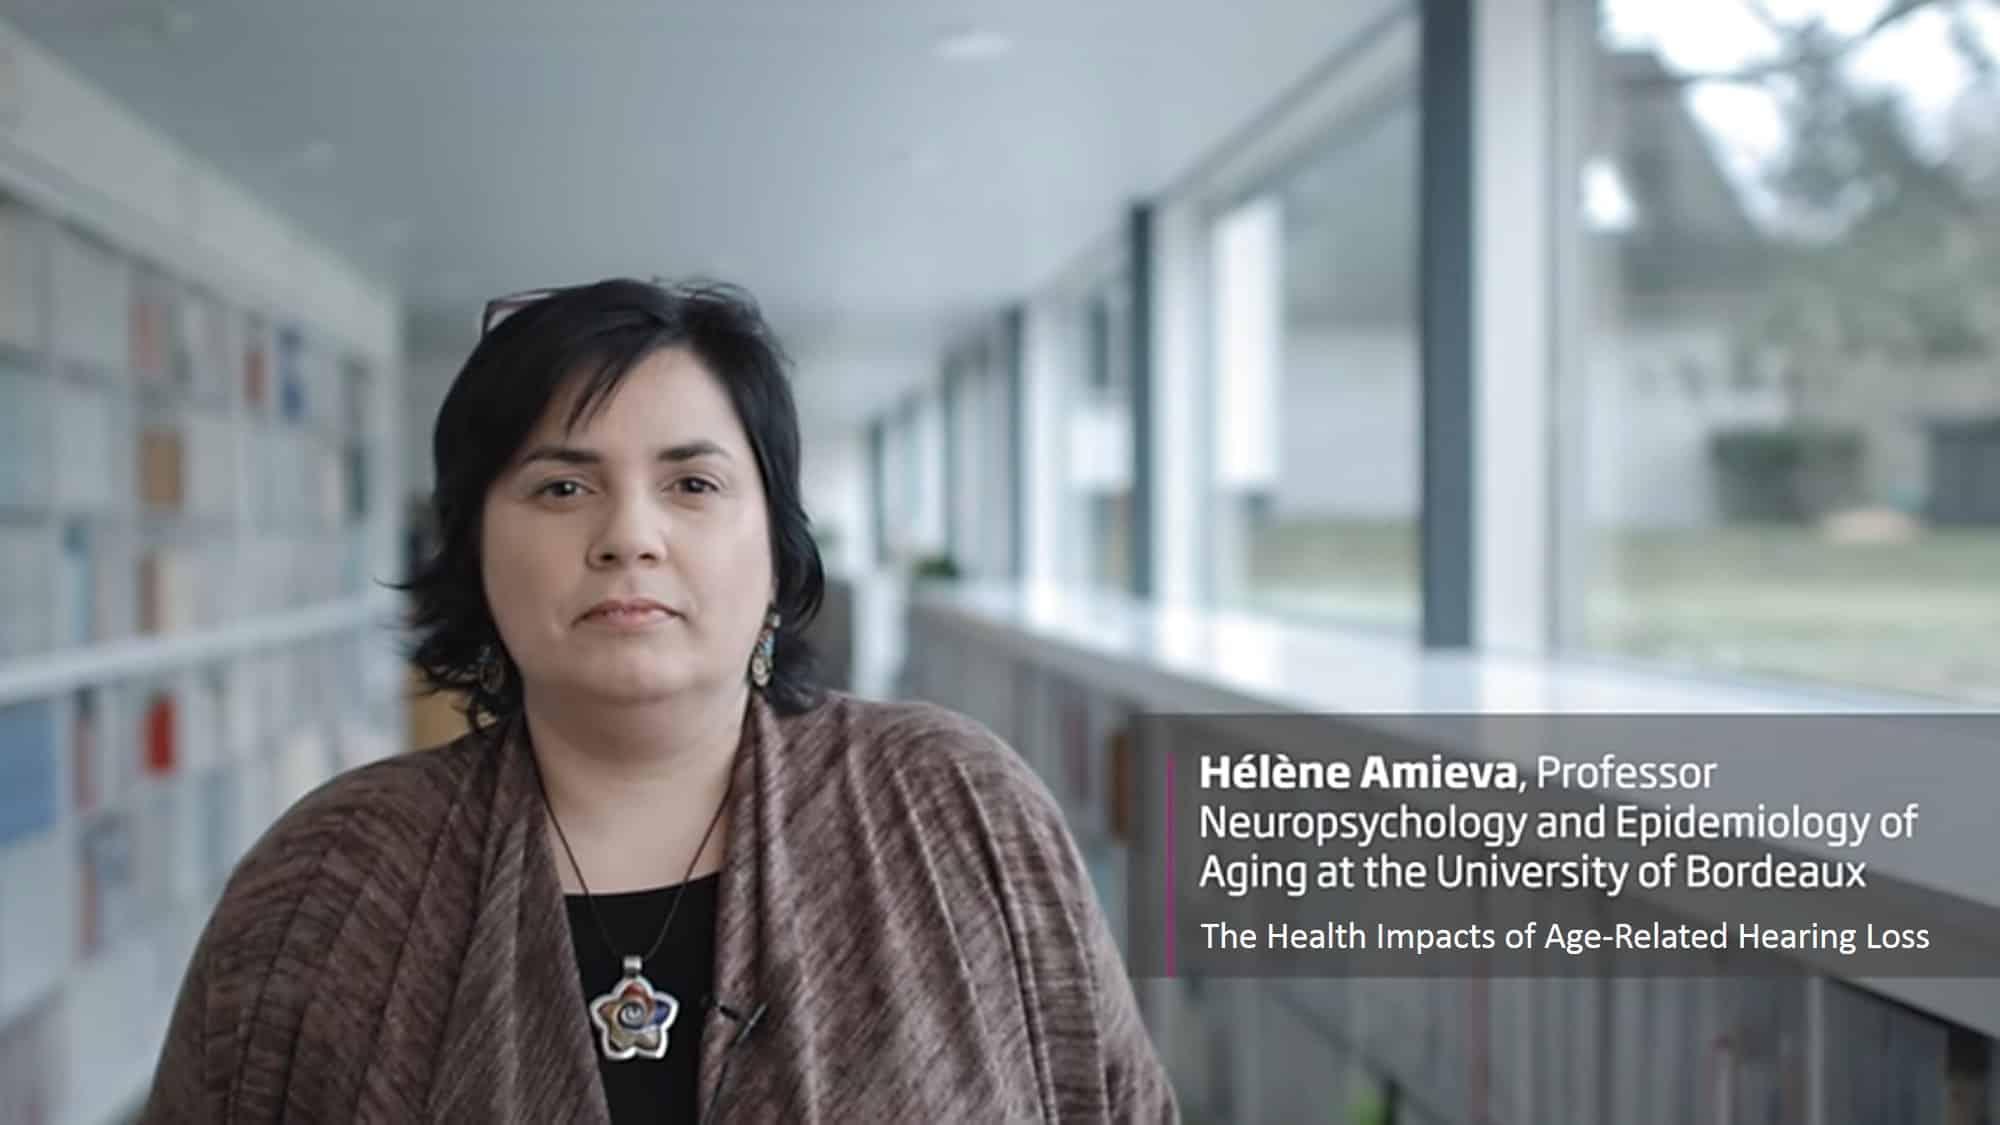 Professor Amieva